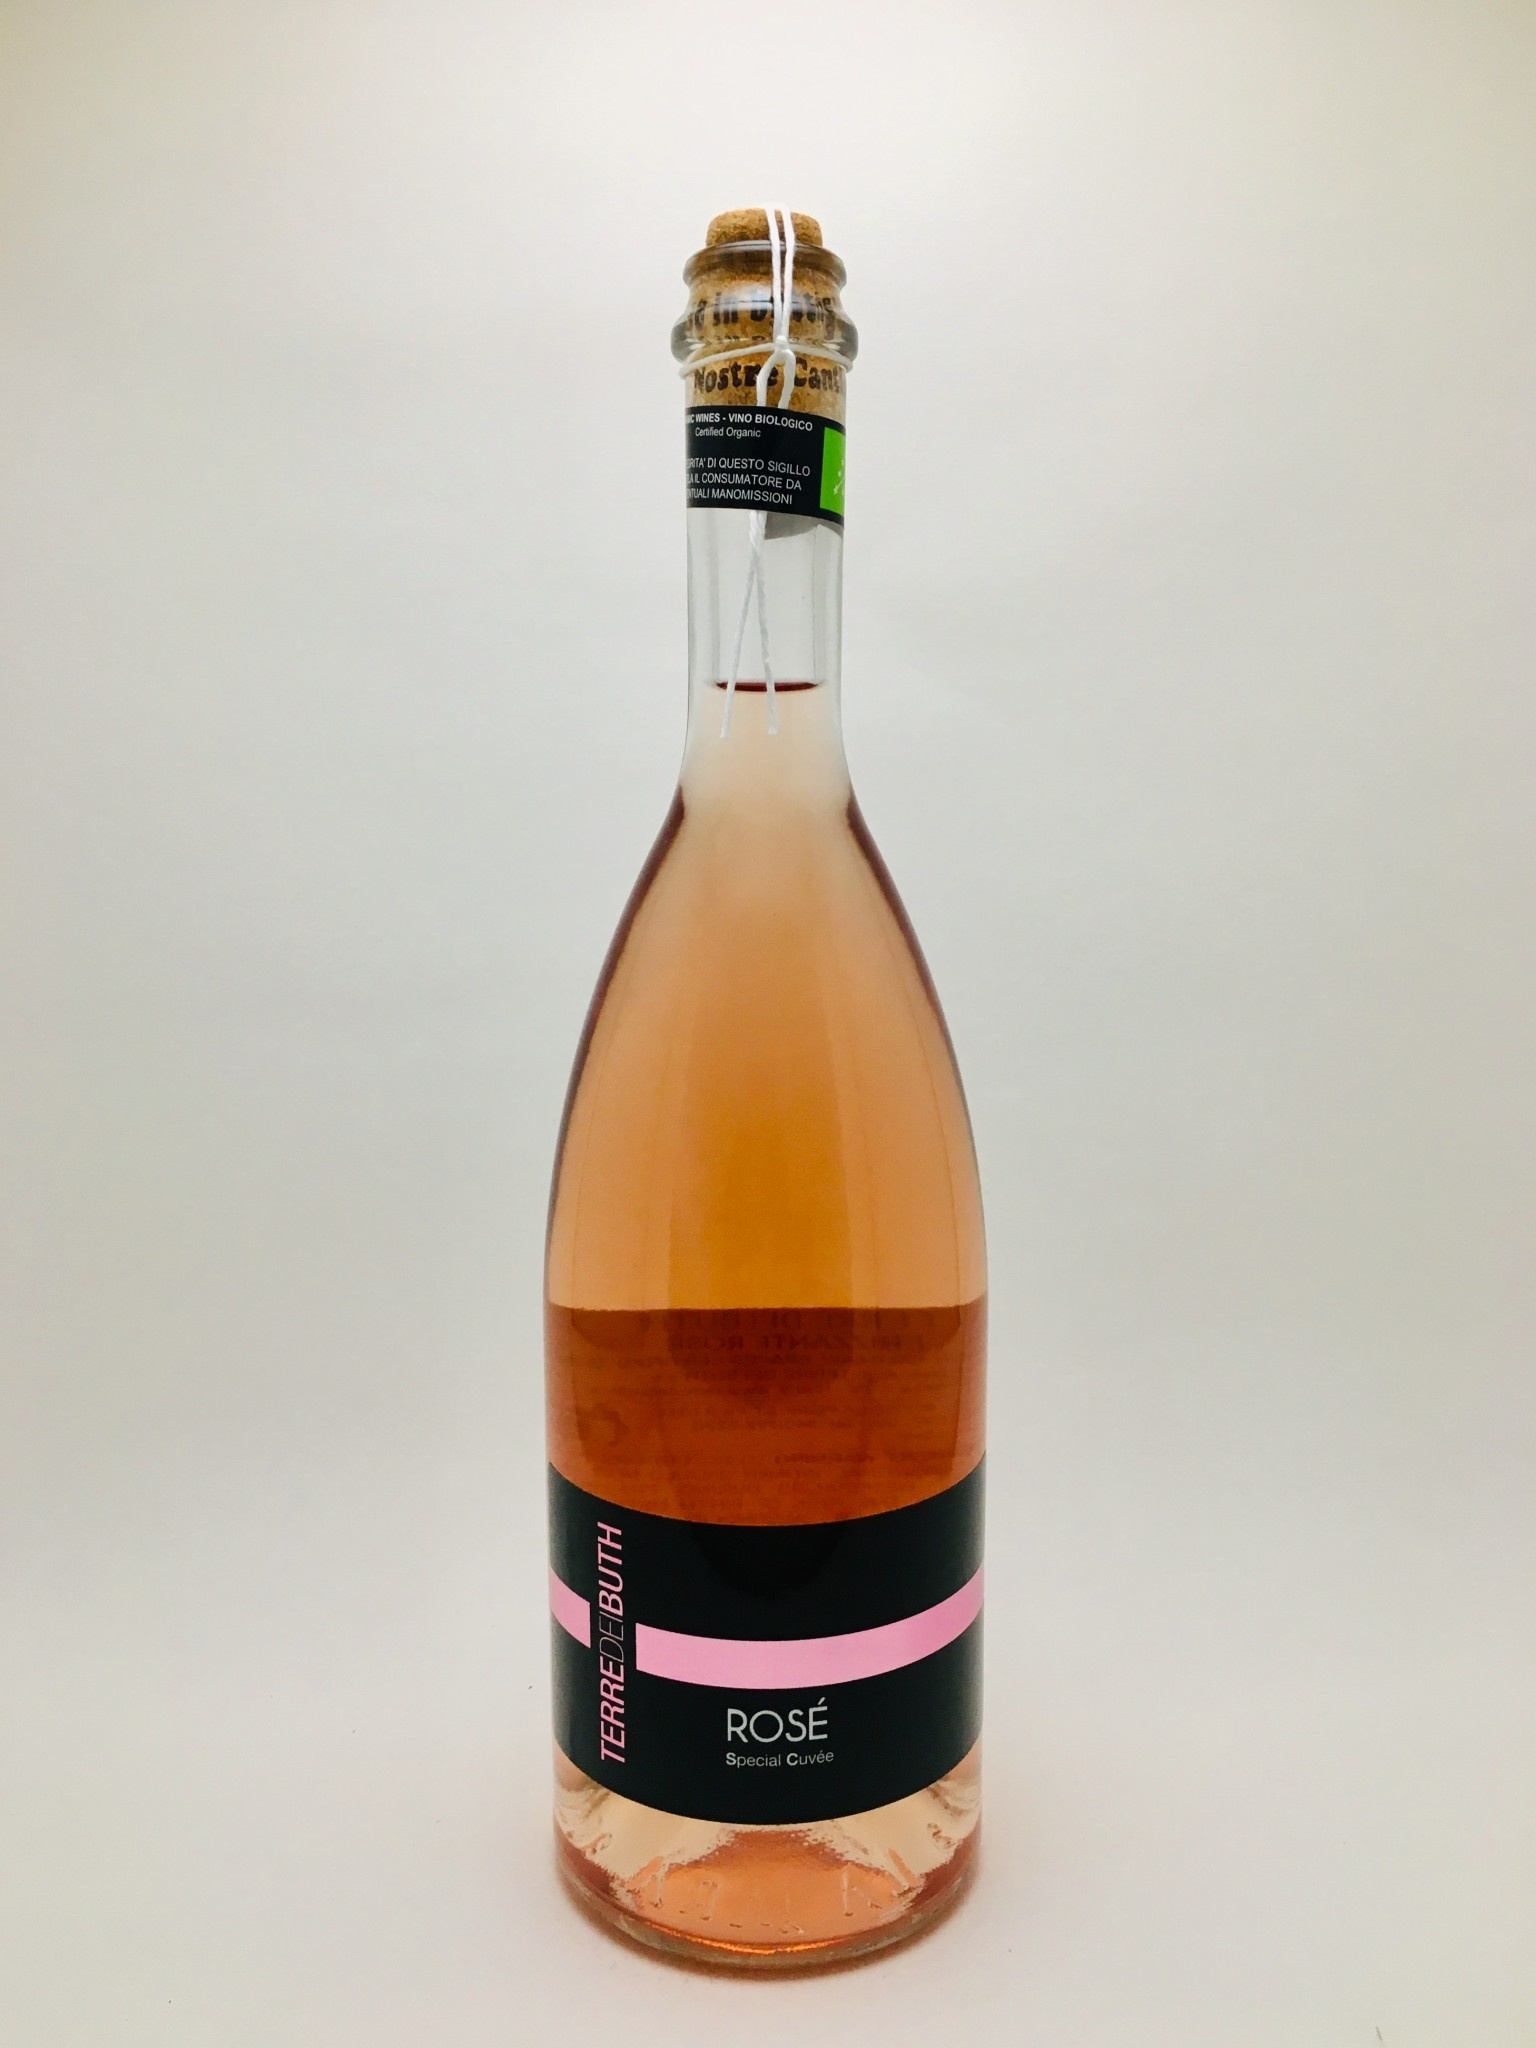 Terre dei Buth, Frizzante Rosé Special Cuvée (NV)